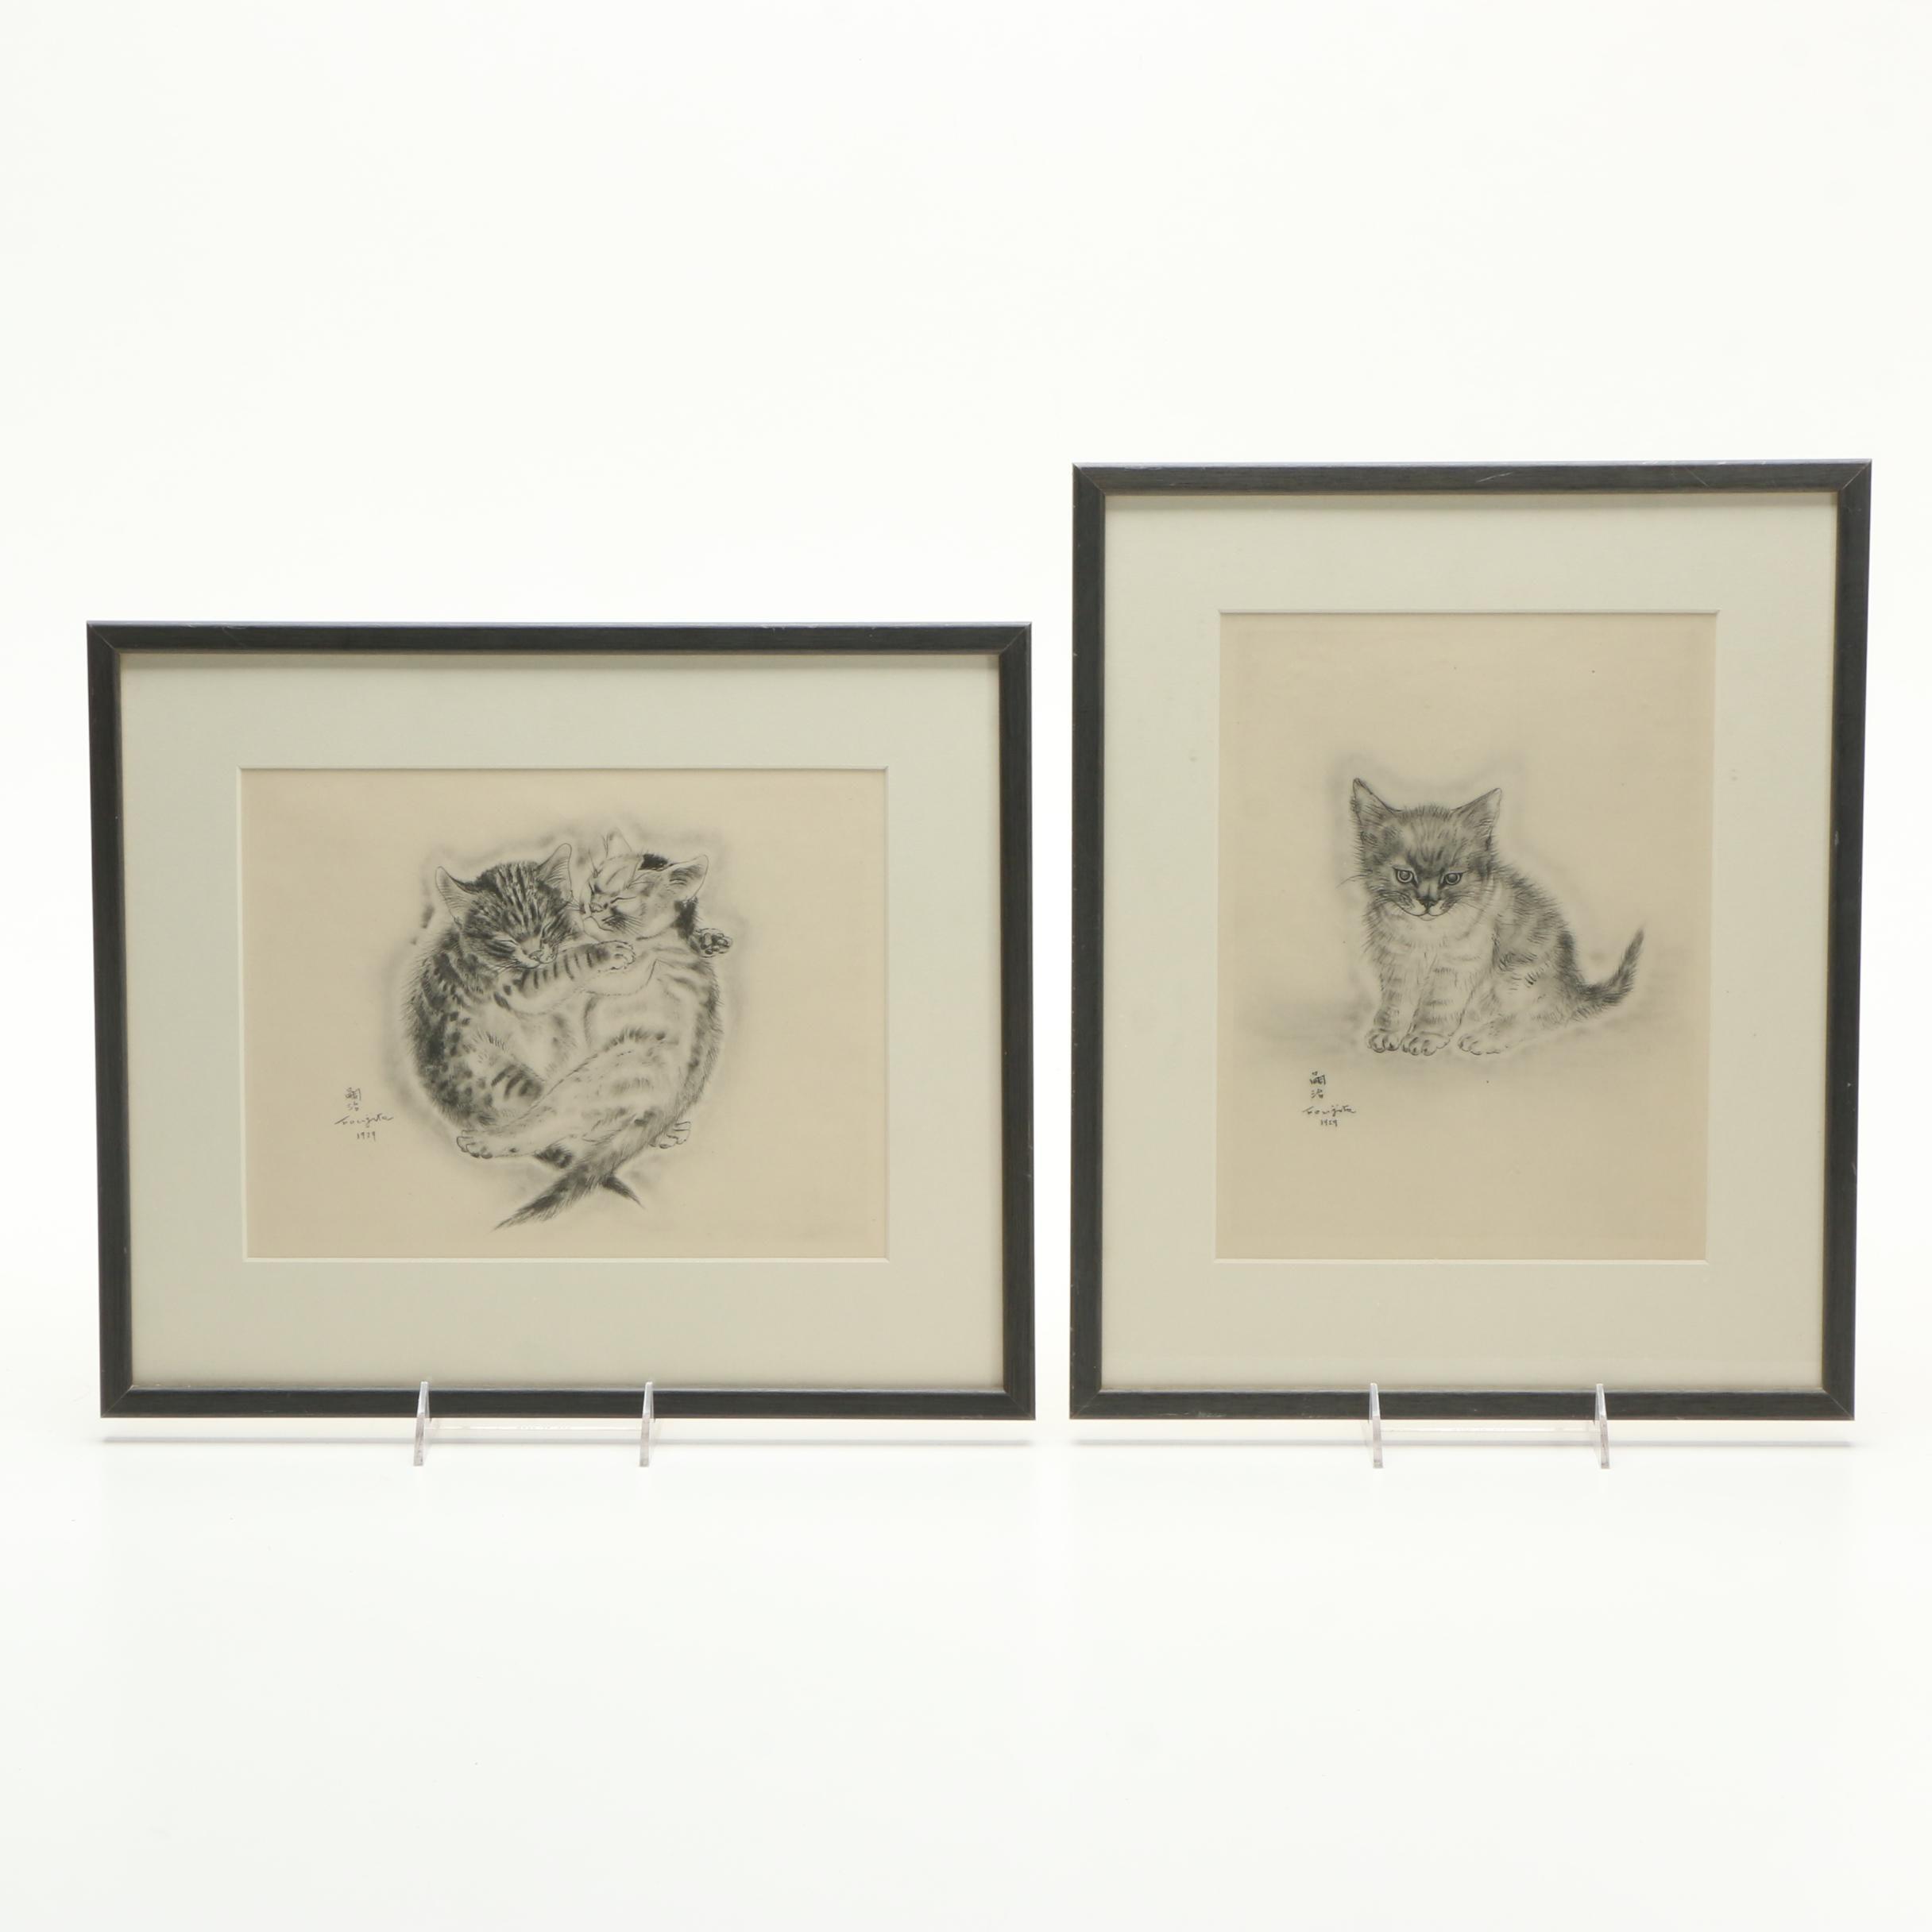 Pair of Léonard Tsuguharu Foujita Aquatint Etchings on Paper